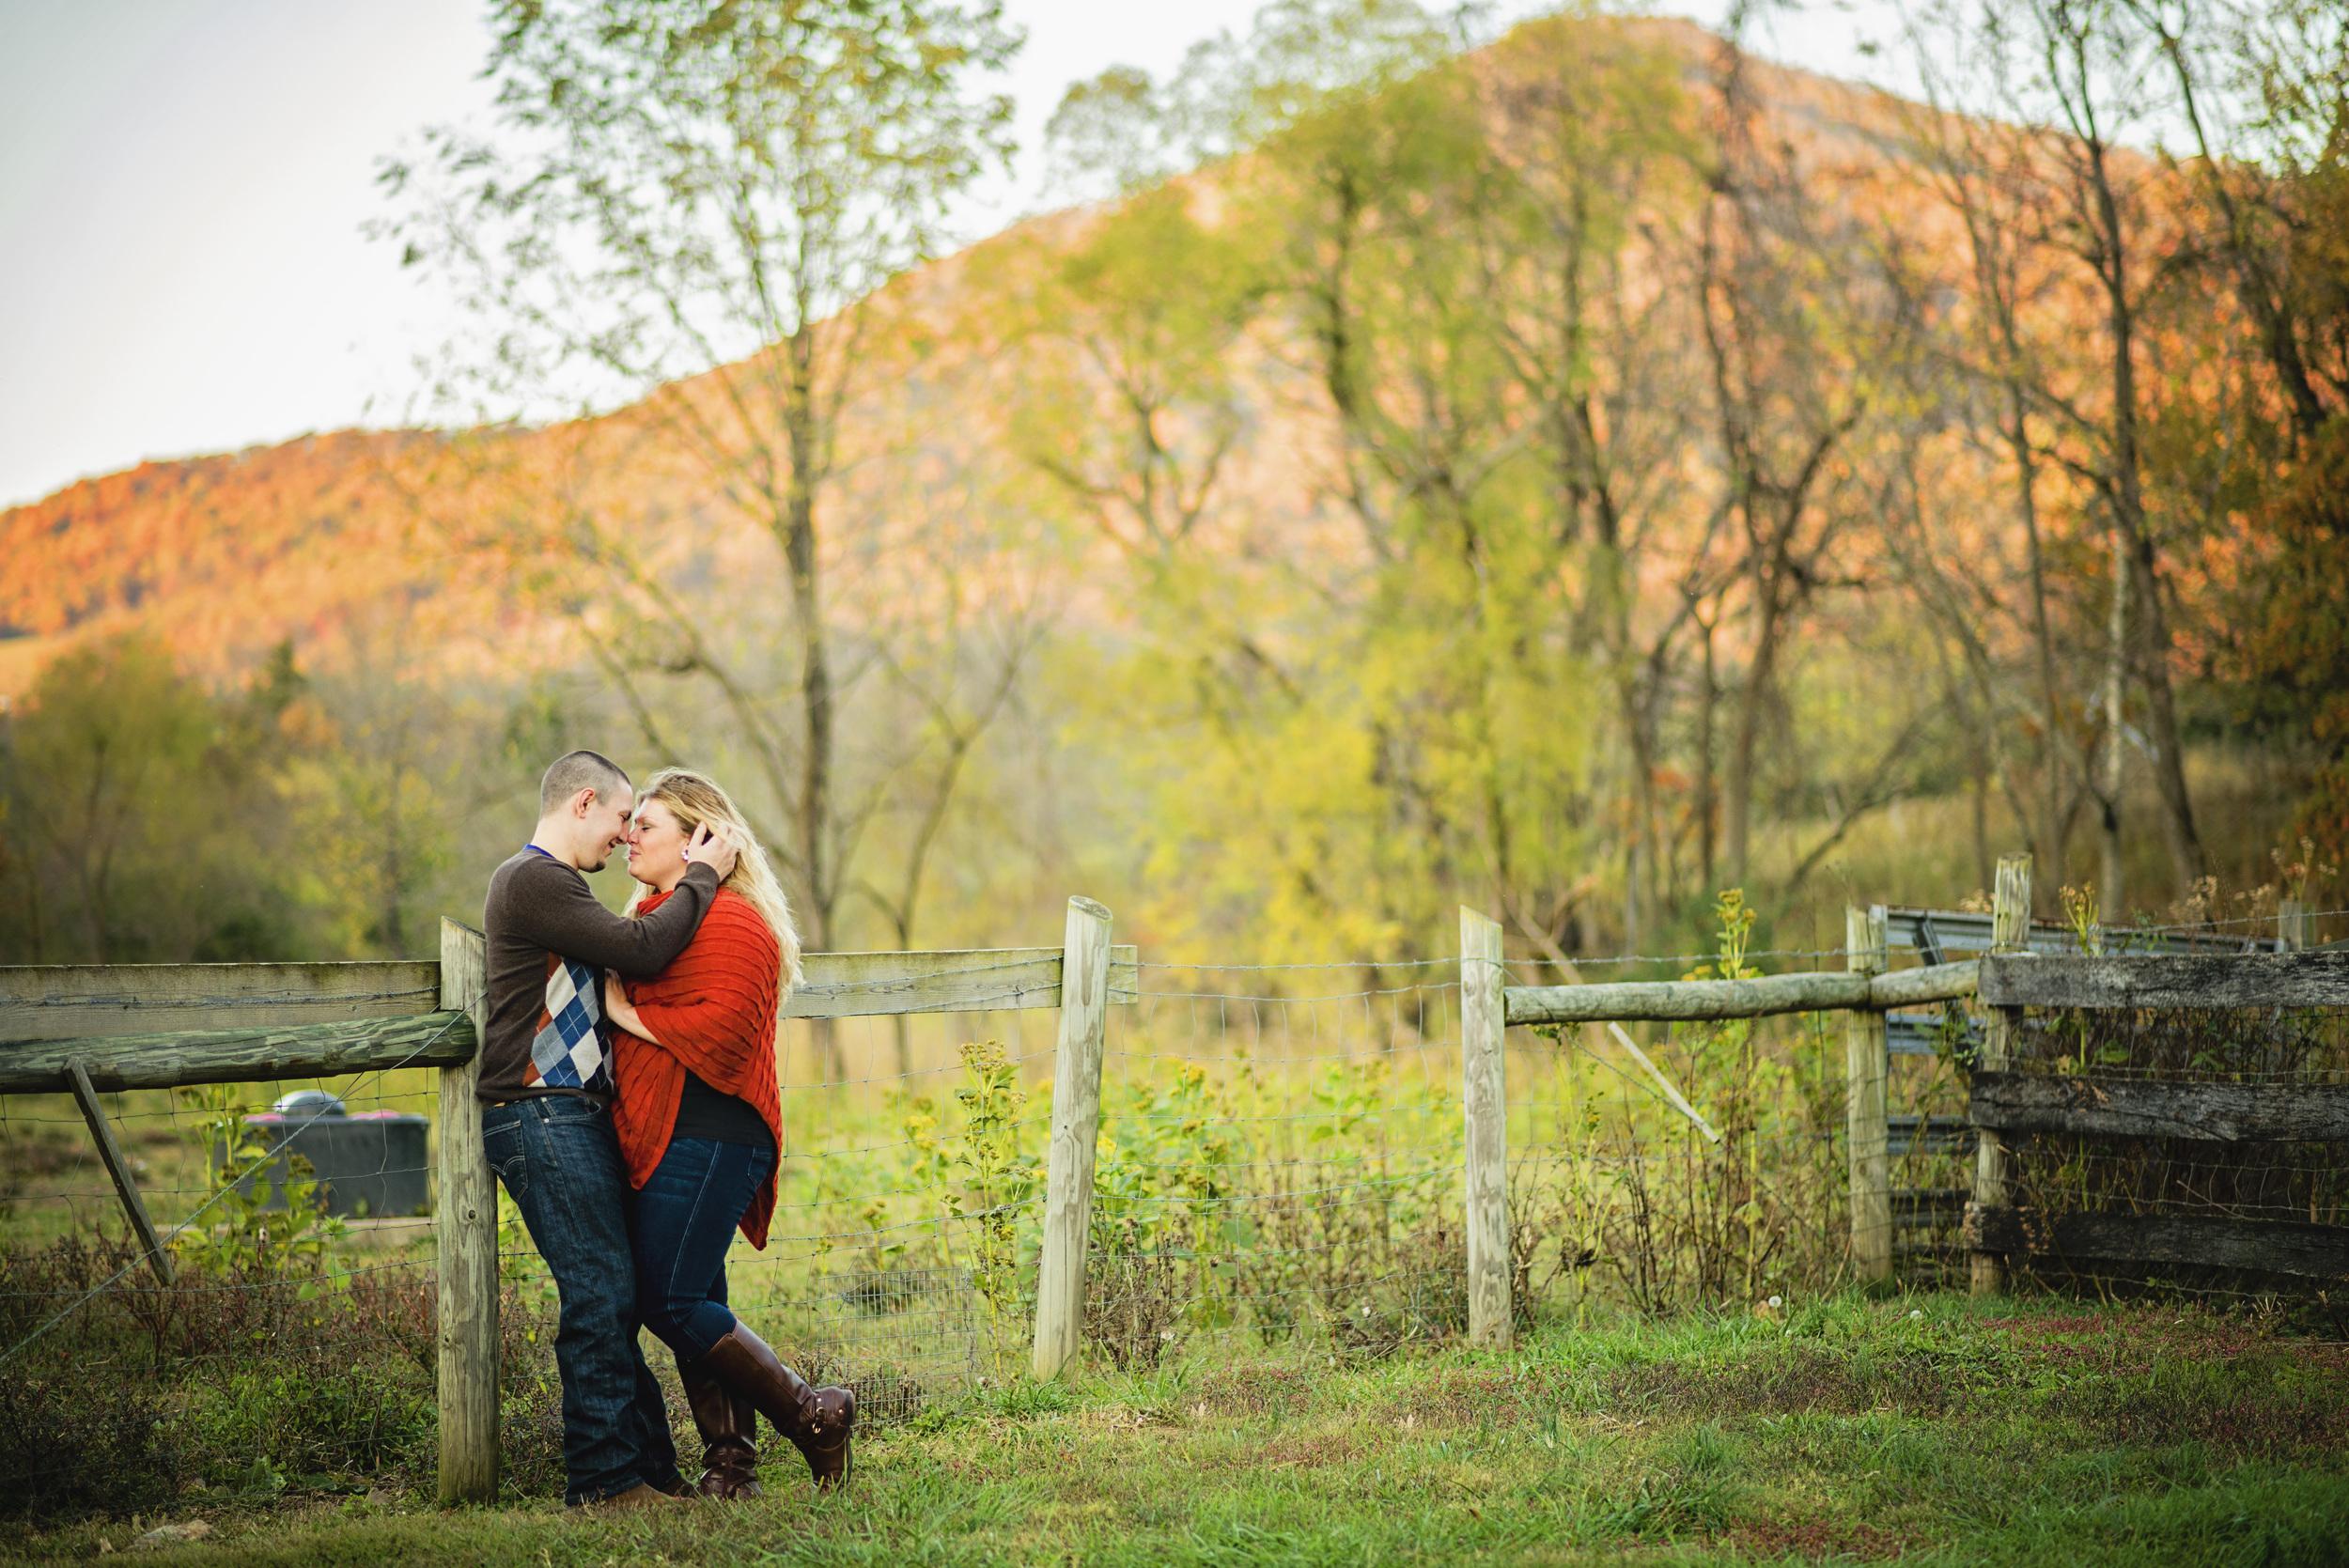 fall_romantic_orchard_engagement_session_lynchburg_va021.jpg